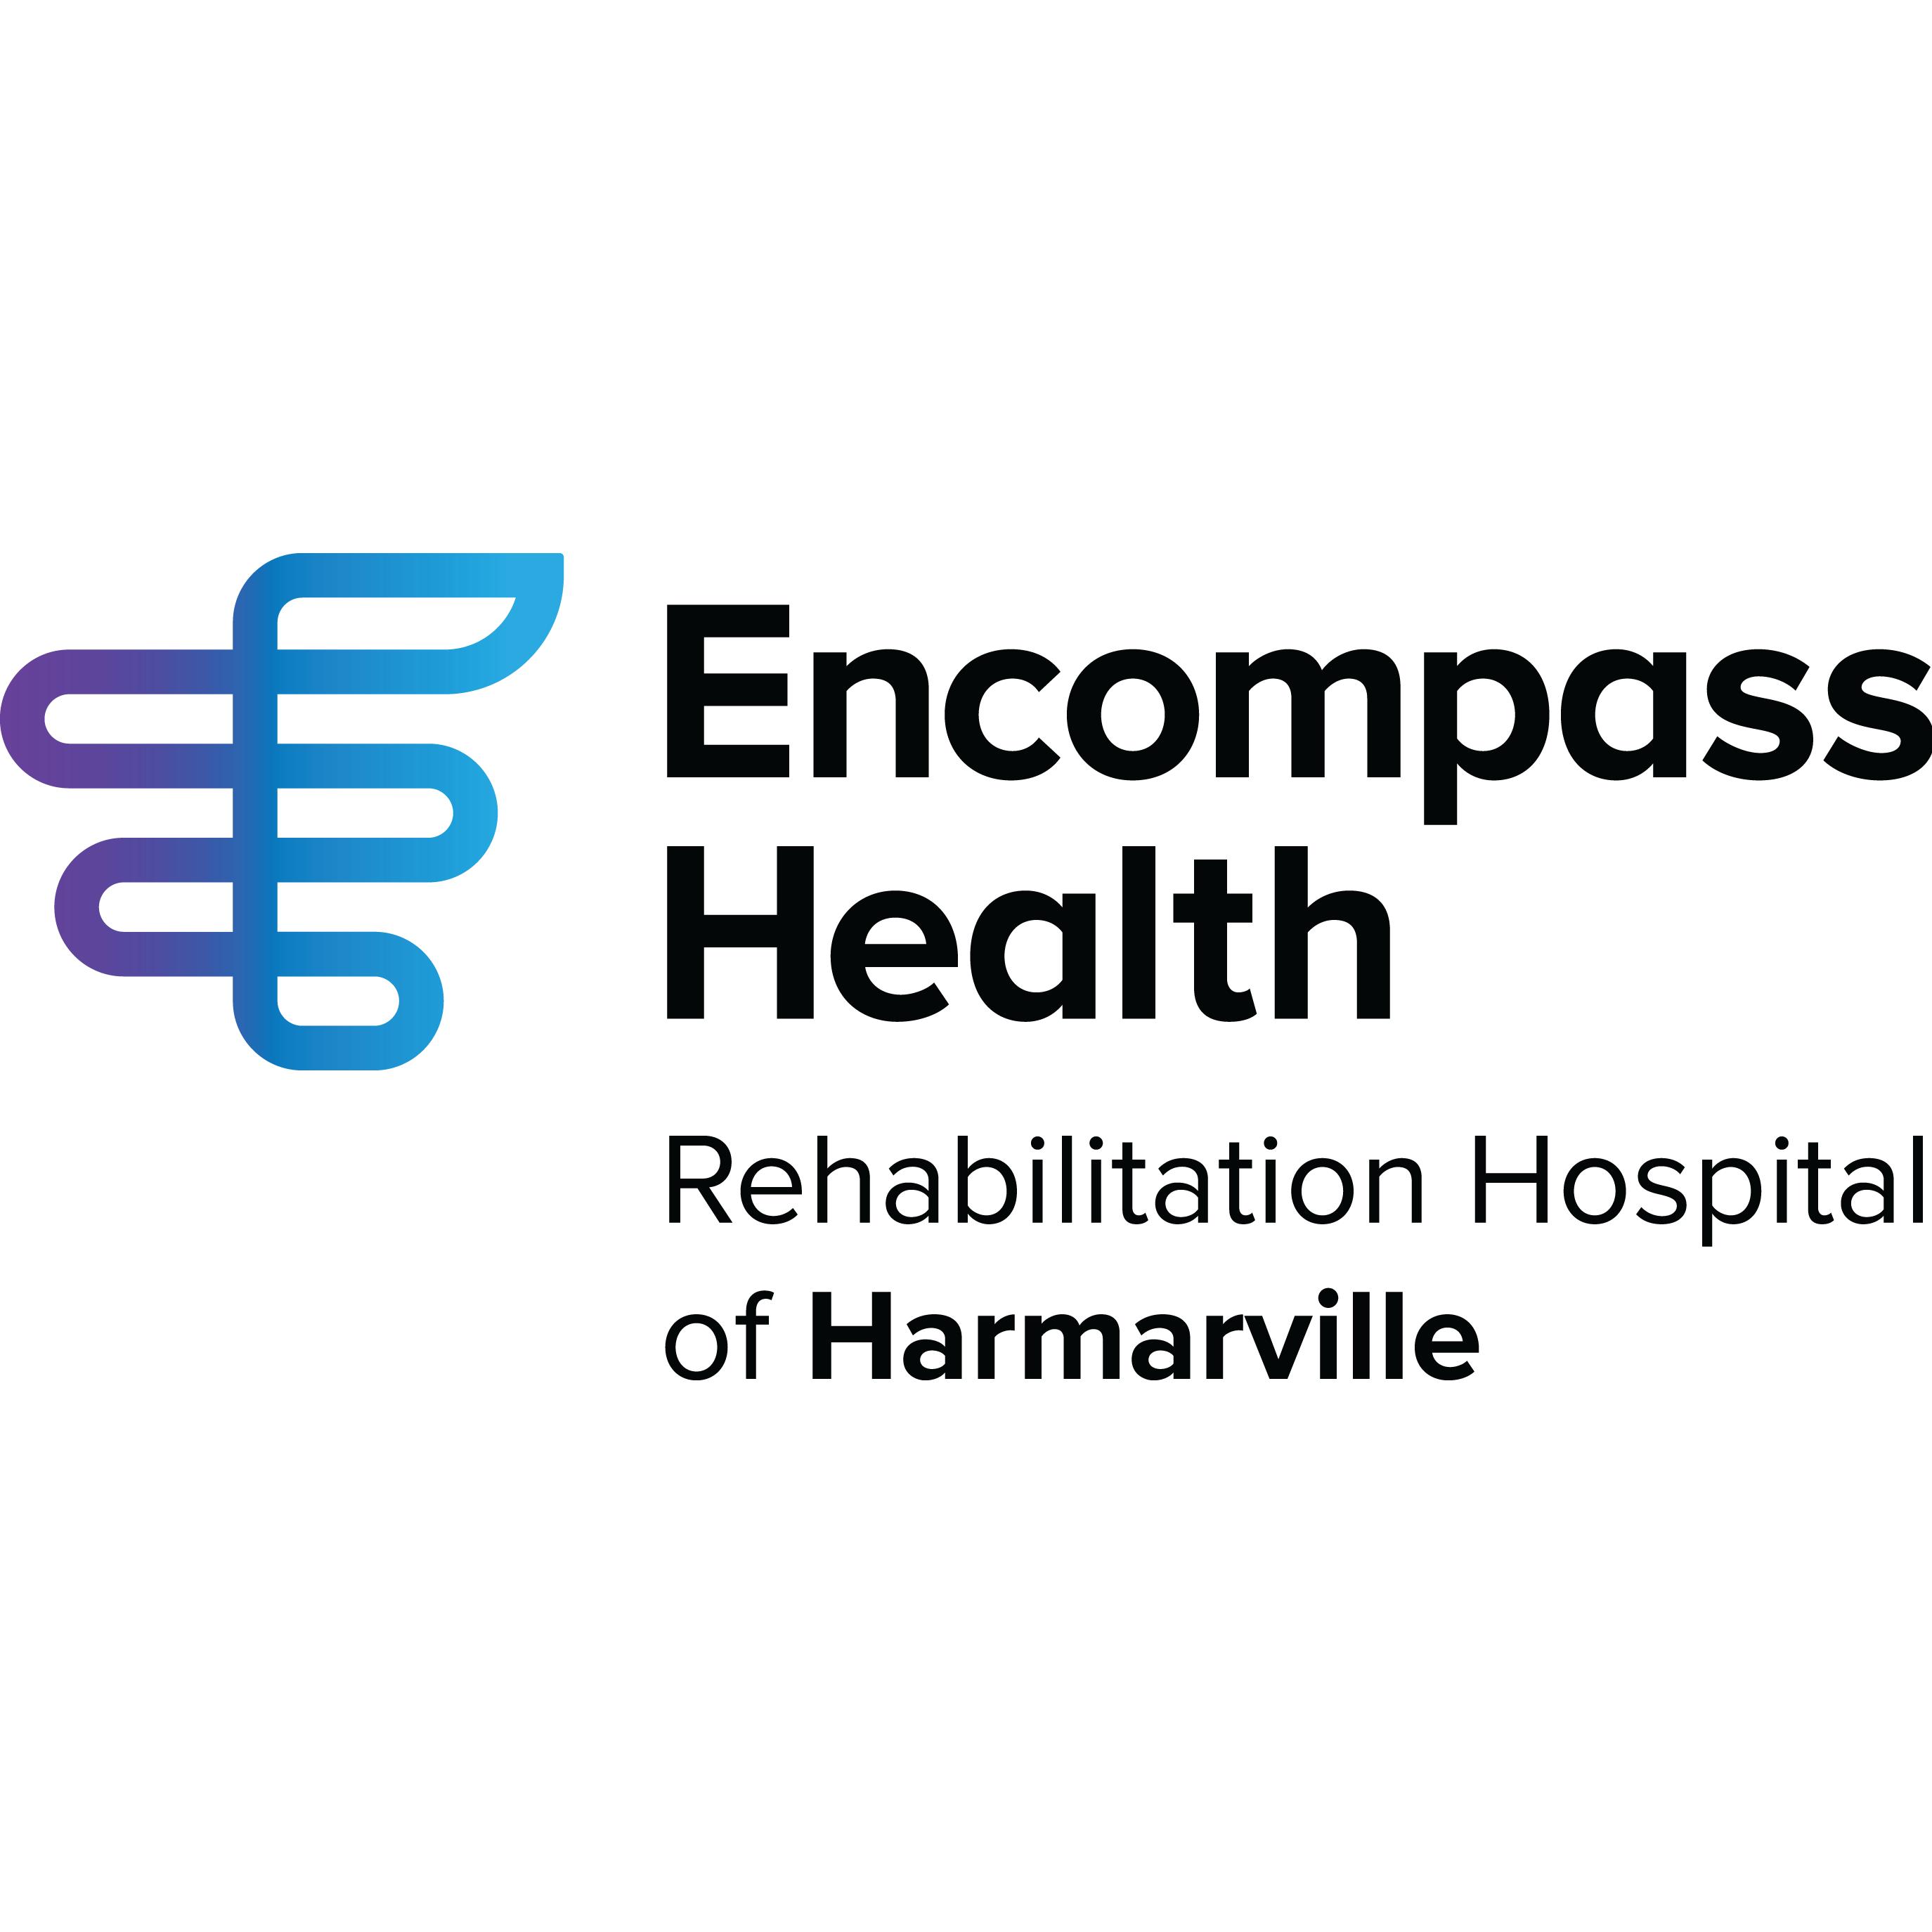 Encompass Health Rehabilitation Hospital of Harmarville